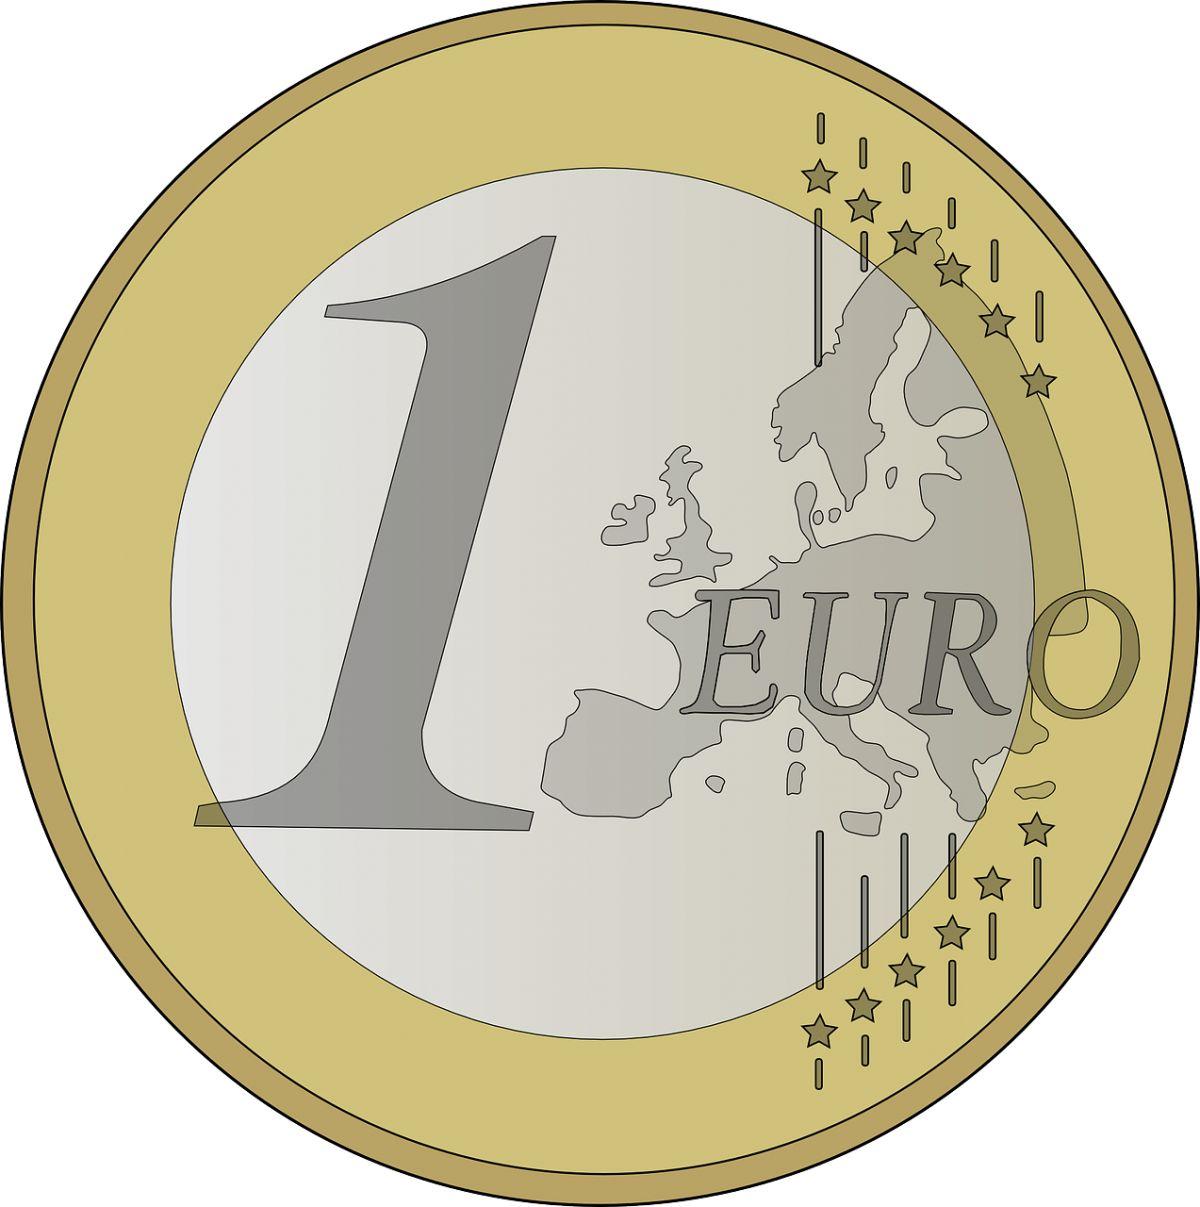 Evro danas 117,5866 dinara